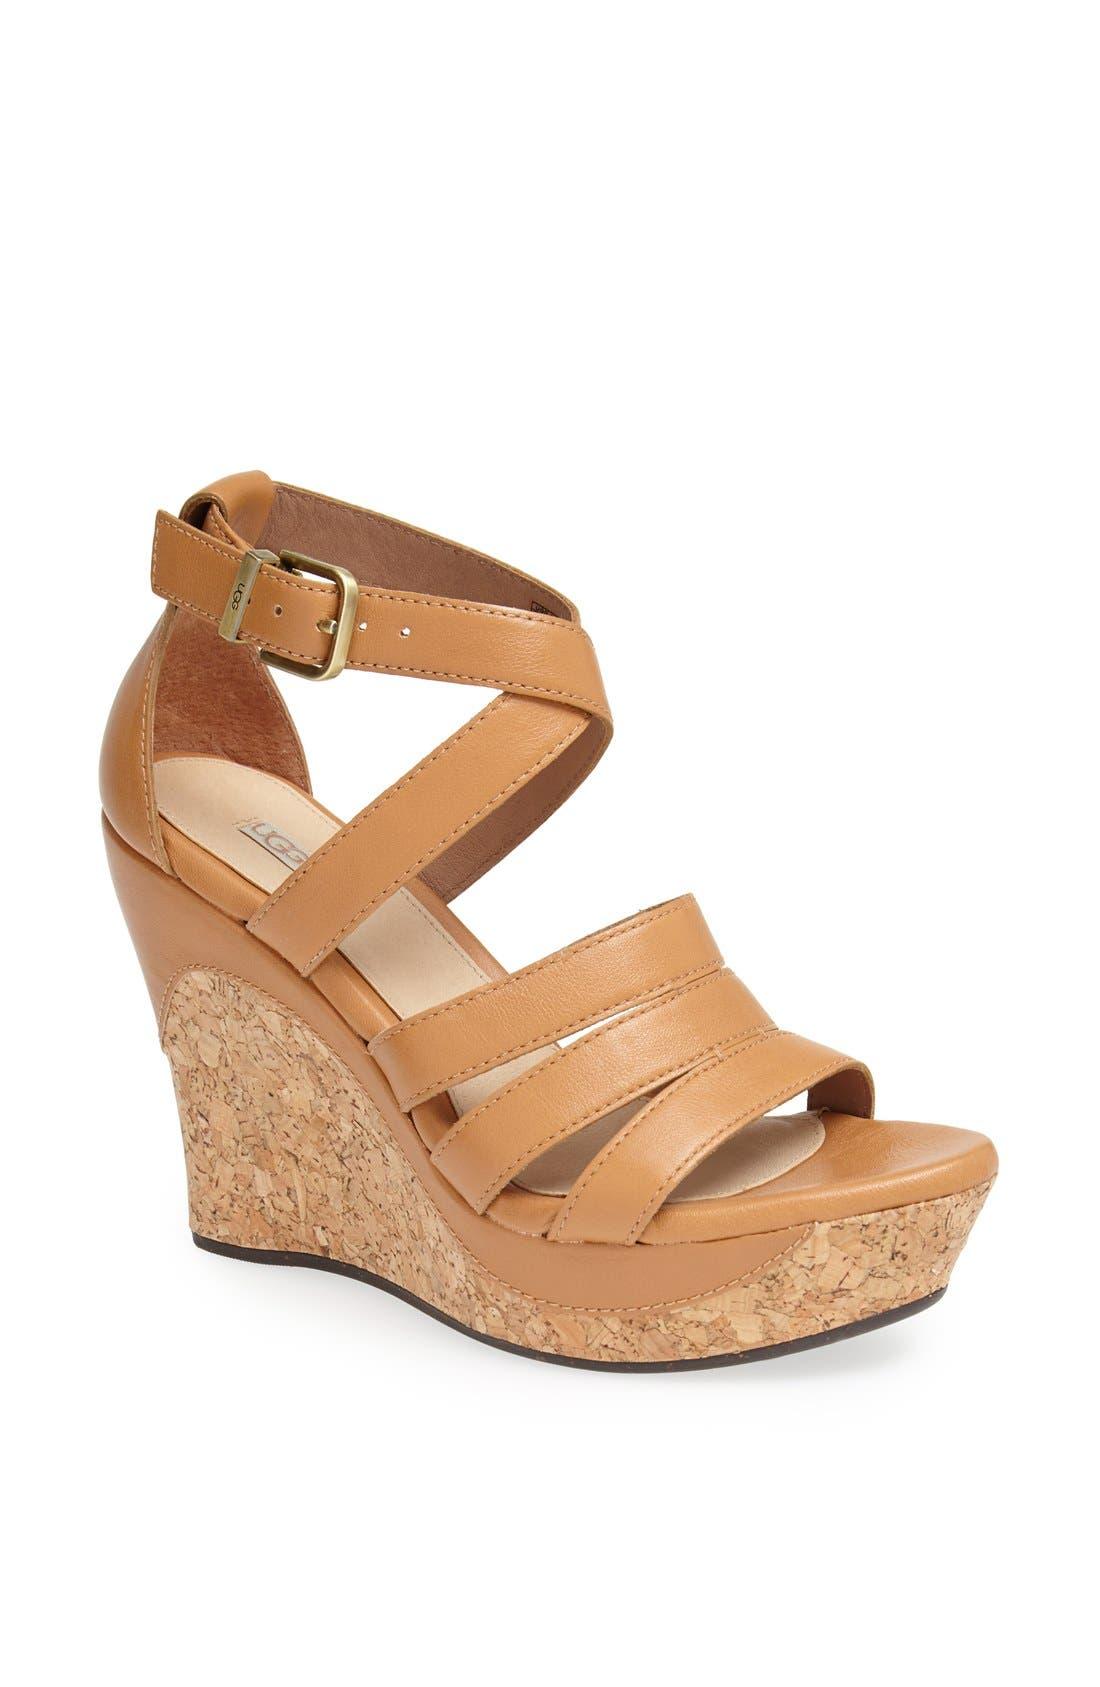 Alternate Image 1 Selected - UGG® Australia 'Dillion' Wedge Sandal